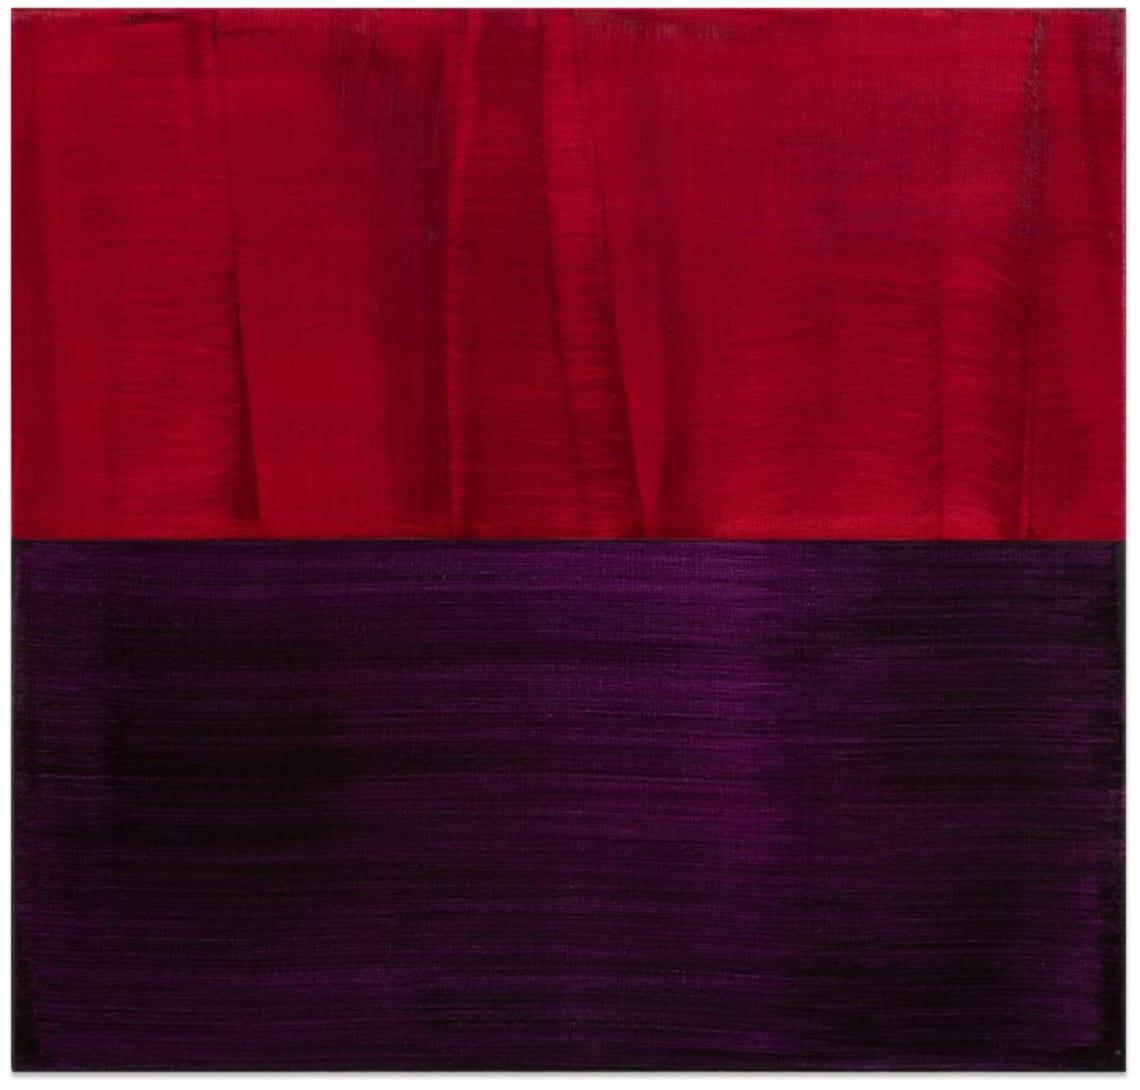 Ricardo Mazal, Red and Violet Blue 1, 2016